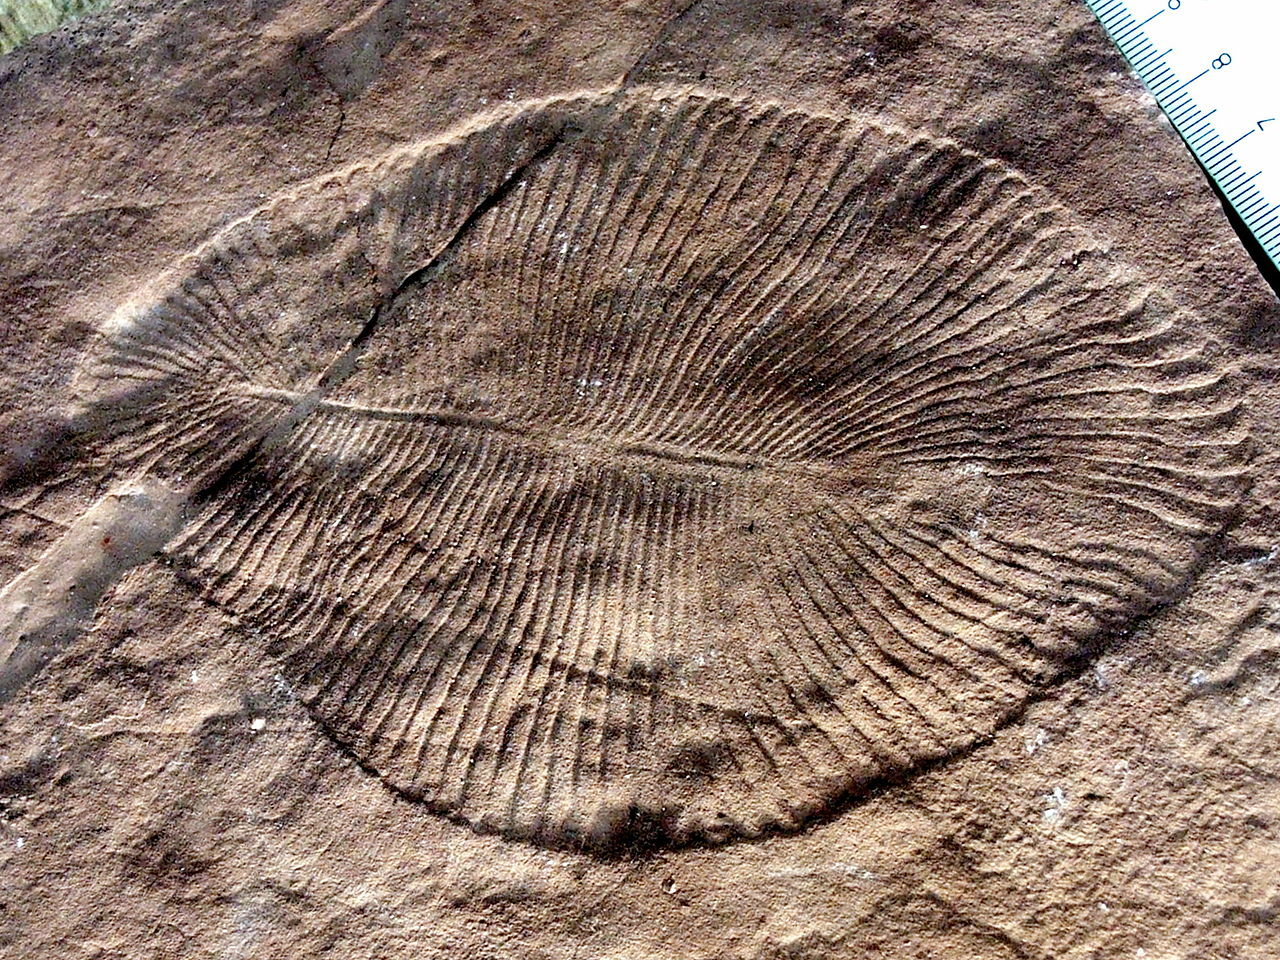 New explanation for Cambrianexplosion?